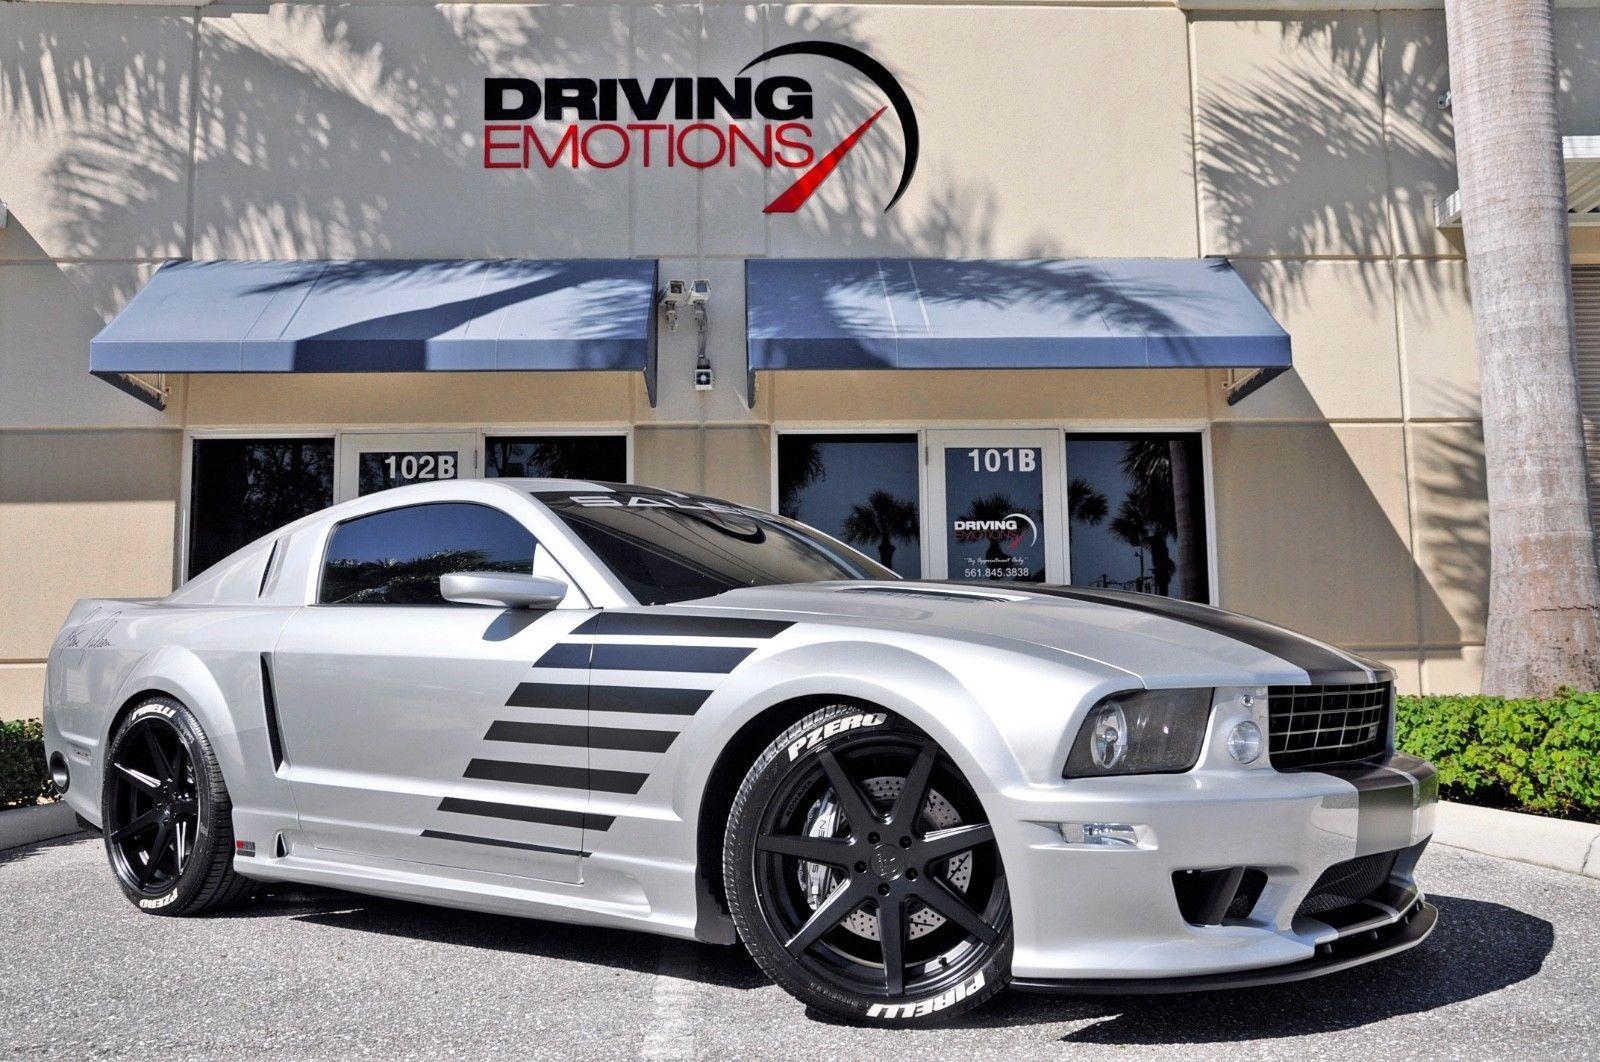 Ebay 2005 Ford Mustang Saleen S281 Sc 2005 Saleen Mustang S281 Sc